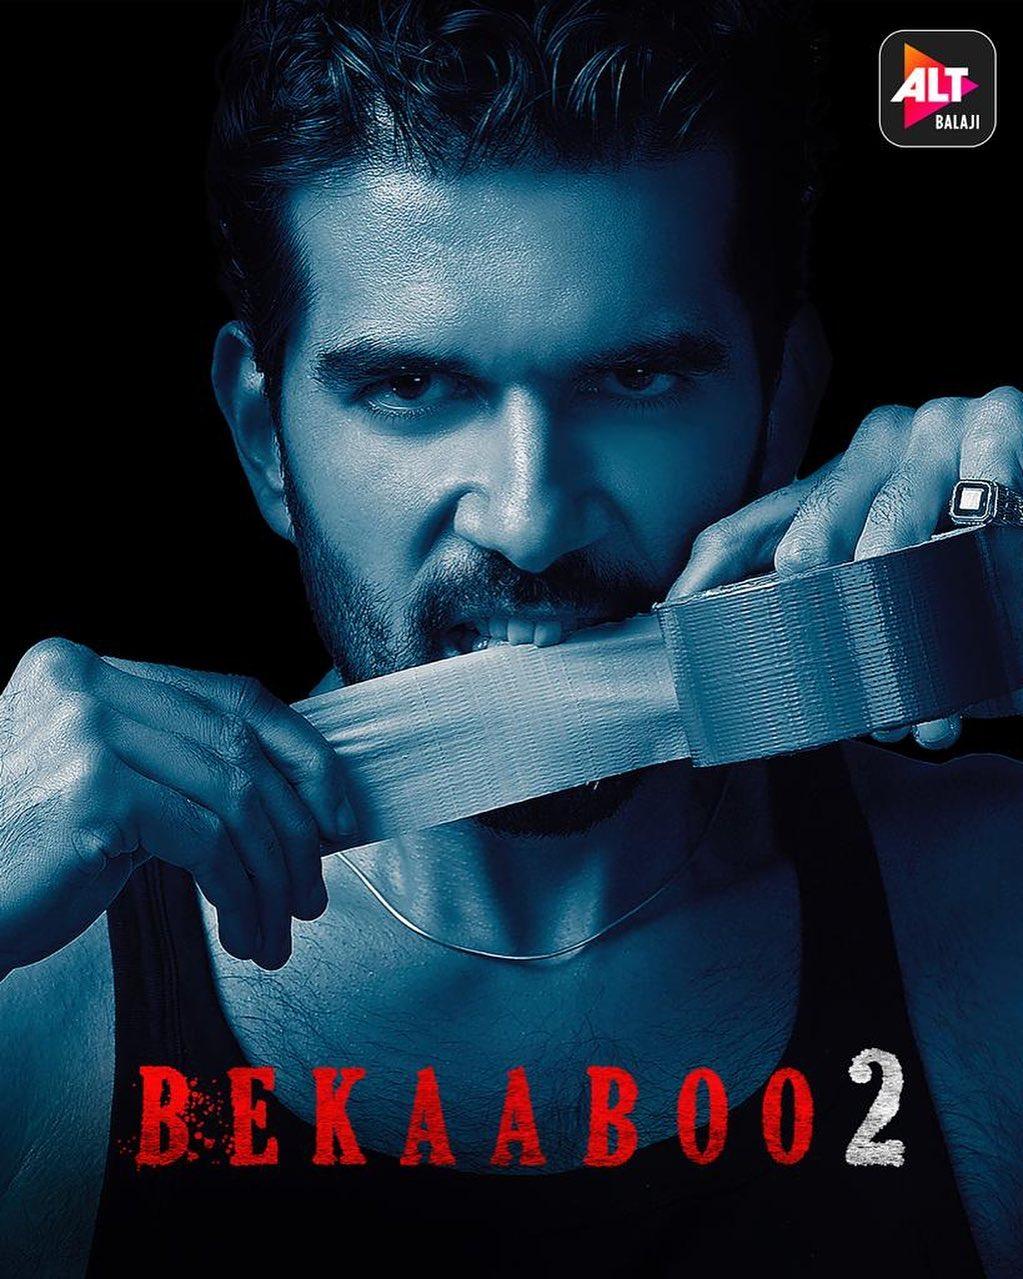 Bekaaboo Season 2 Review, Cast & Plot: A sloppy return